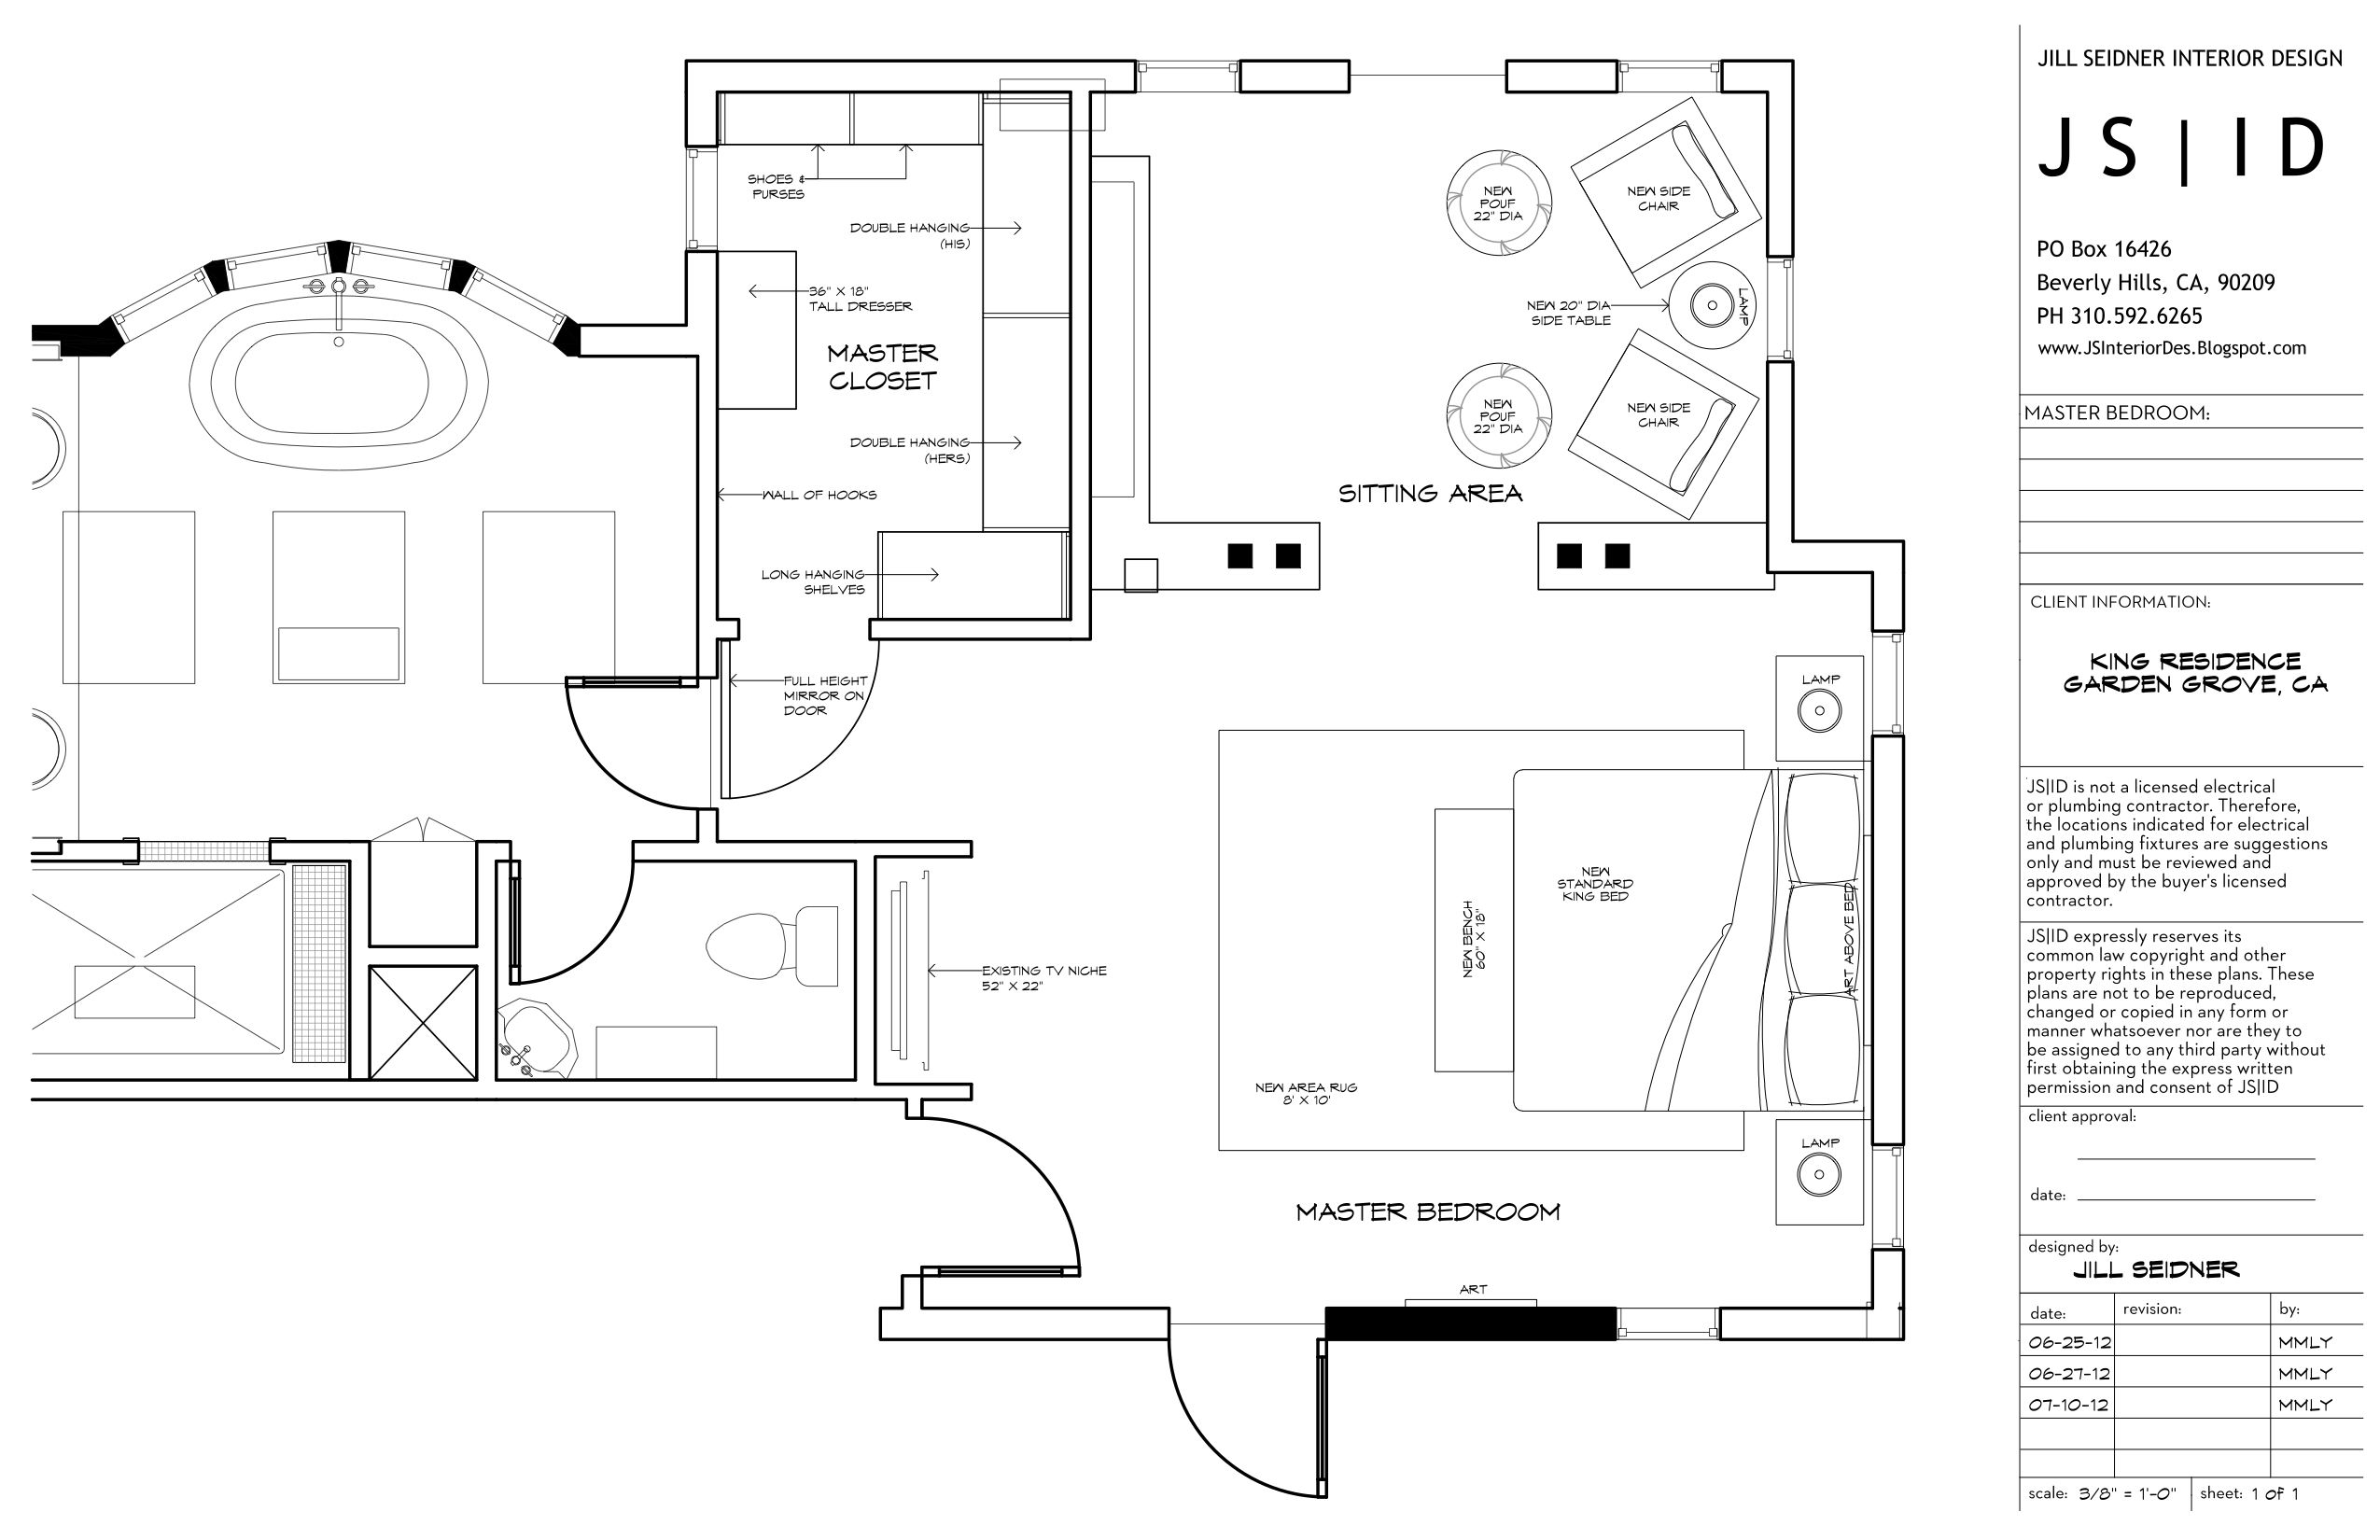 design plans walk bedroom for decoration tedxumkc closet of image small in ideas